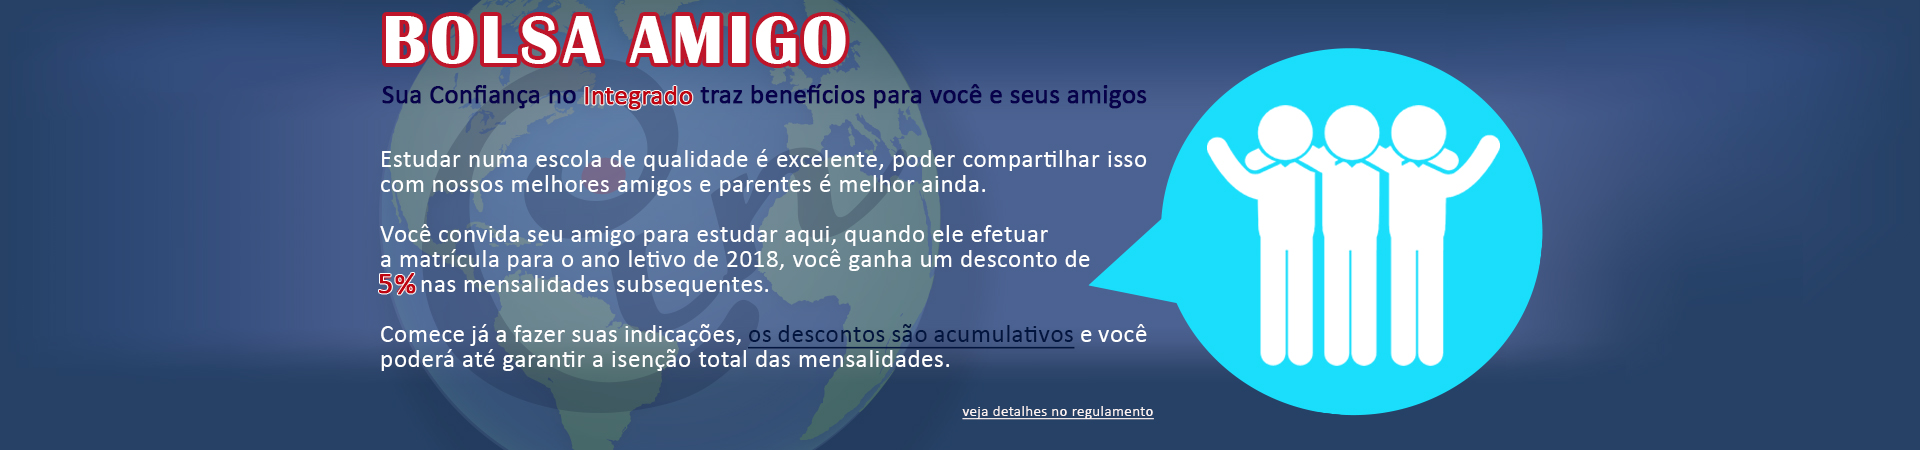 banner-site-amigo